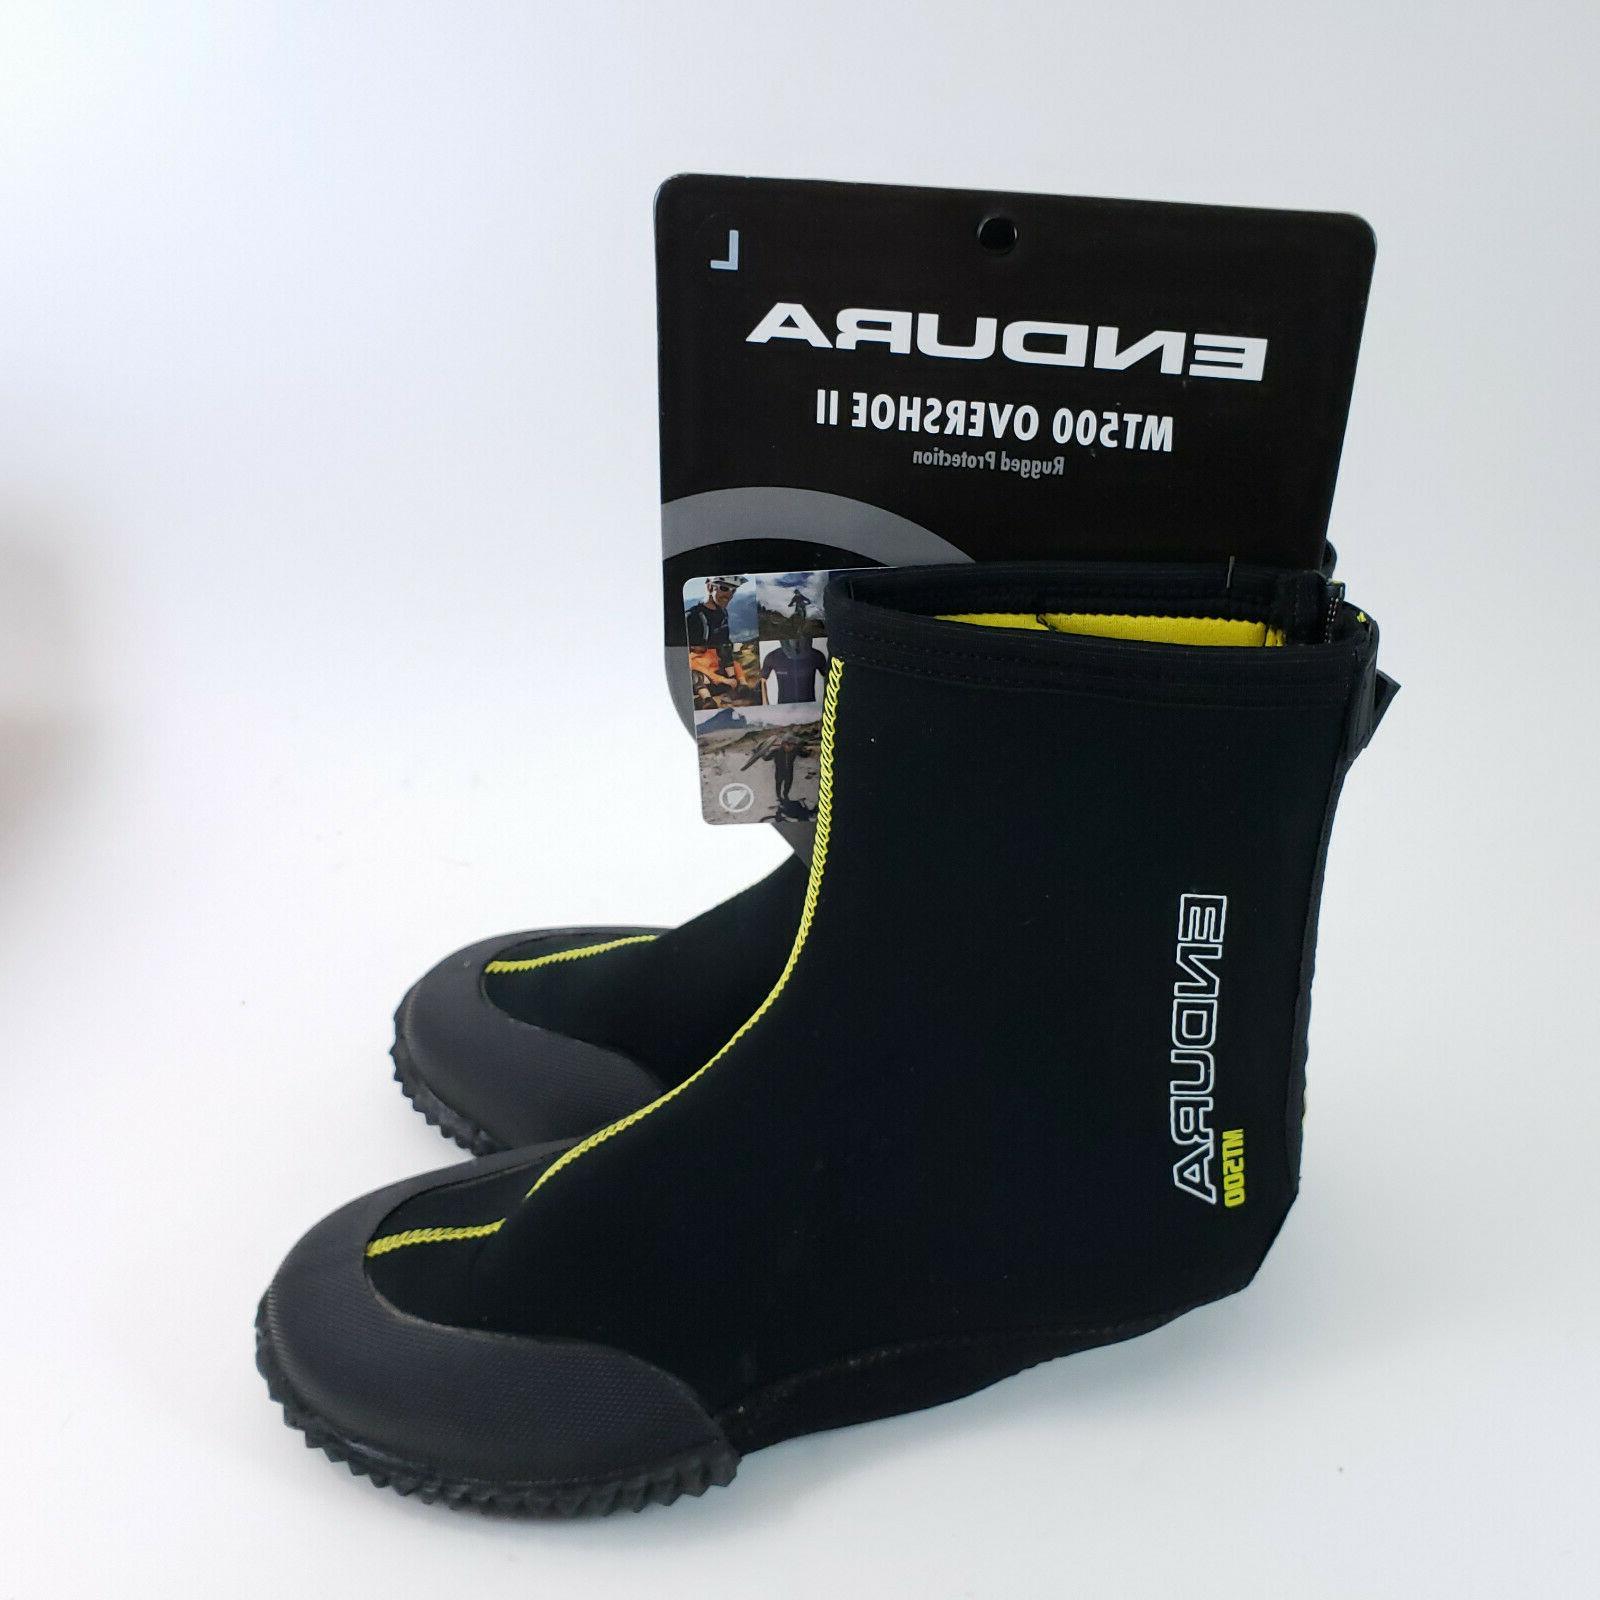 Endura MT500 II Overshoes Mountain Cycling Shoe Covers/Booti